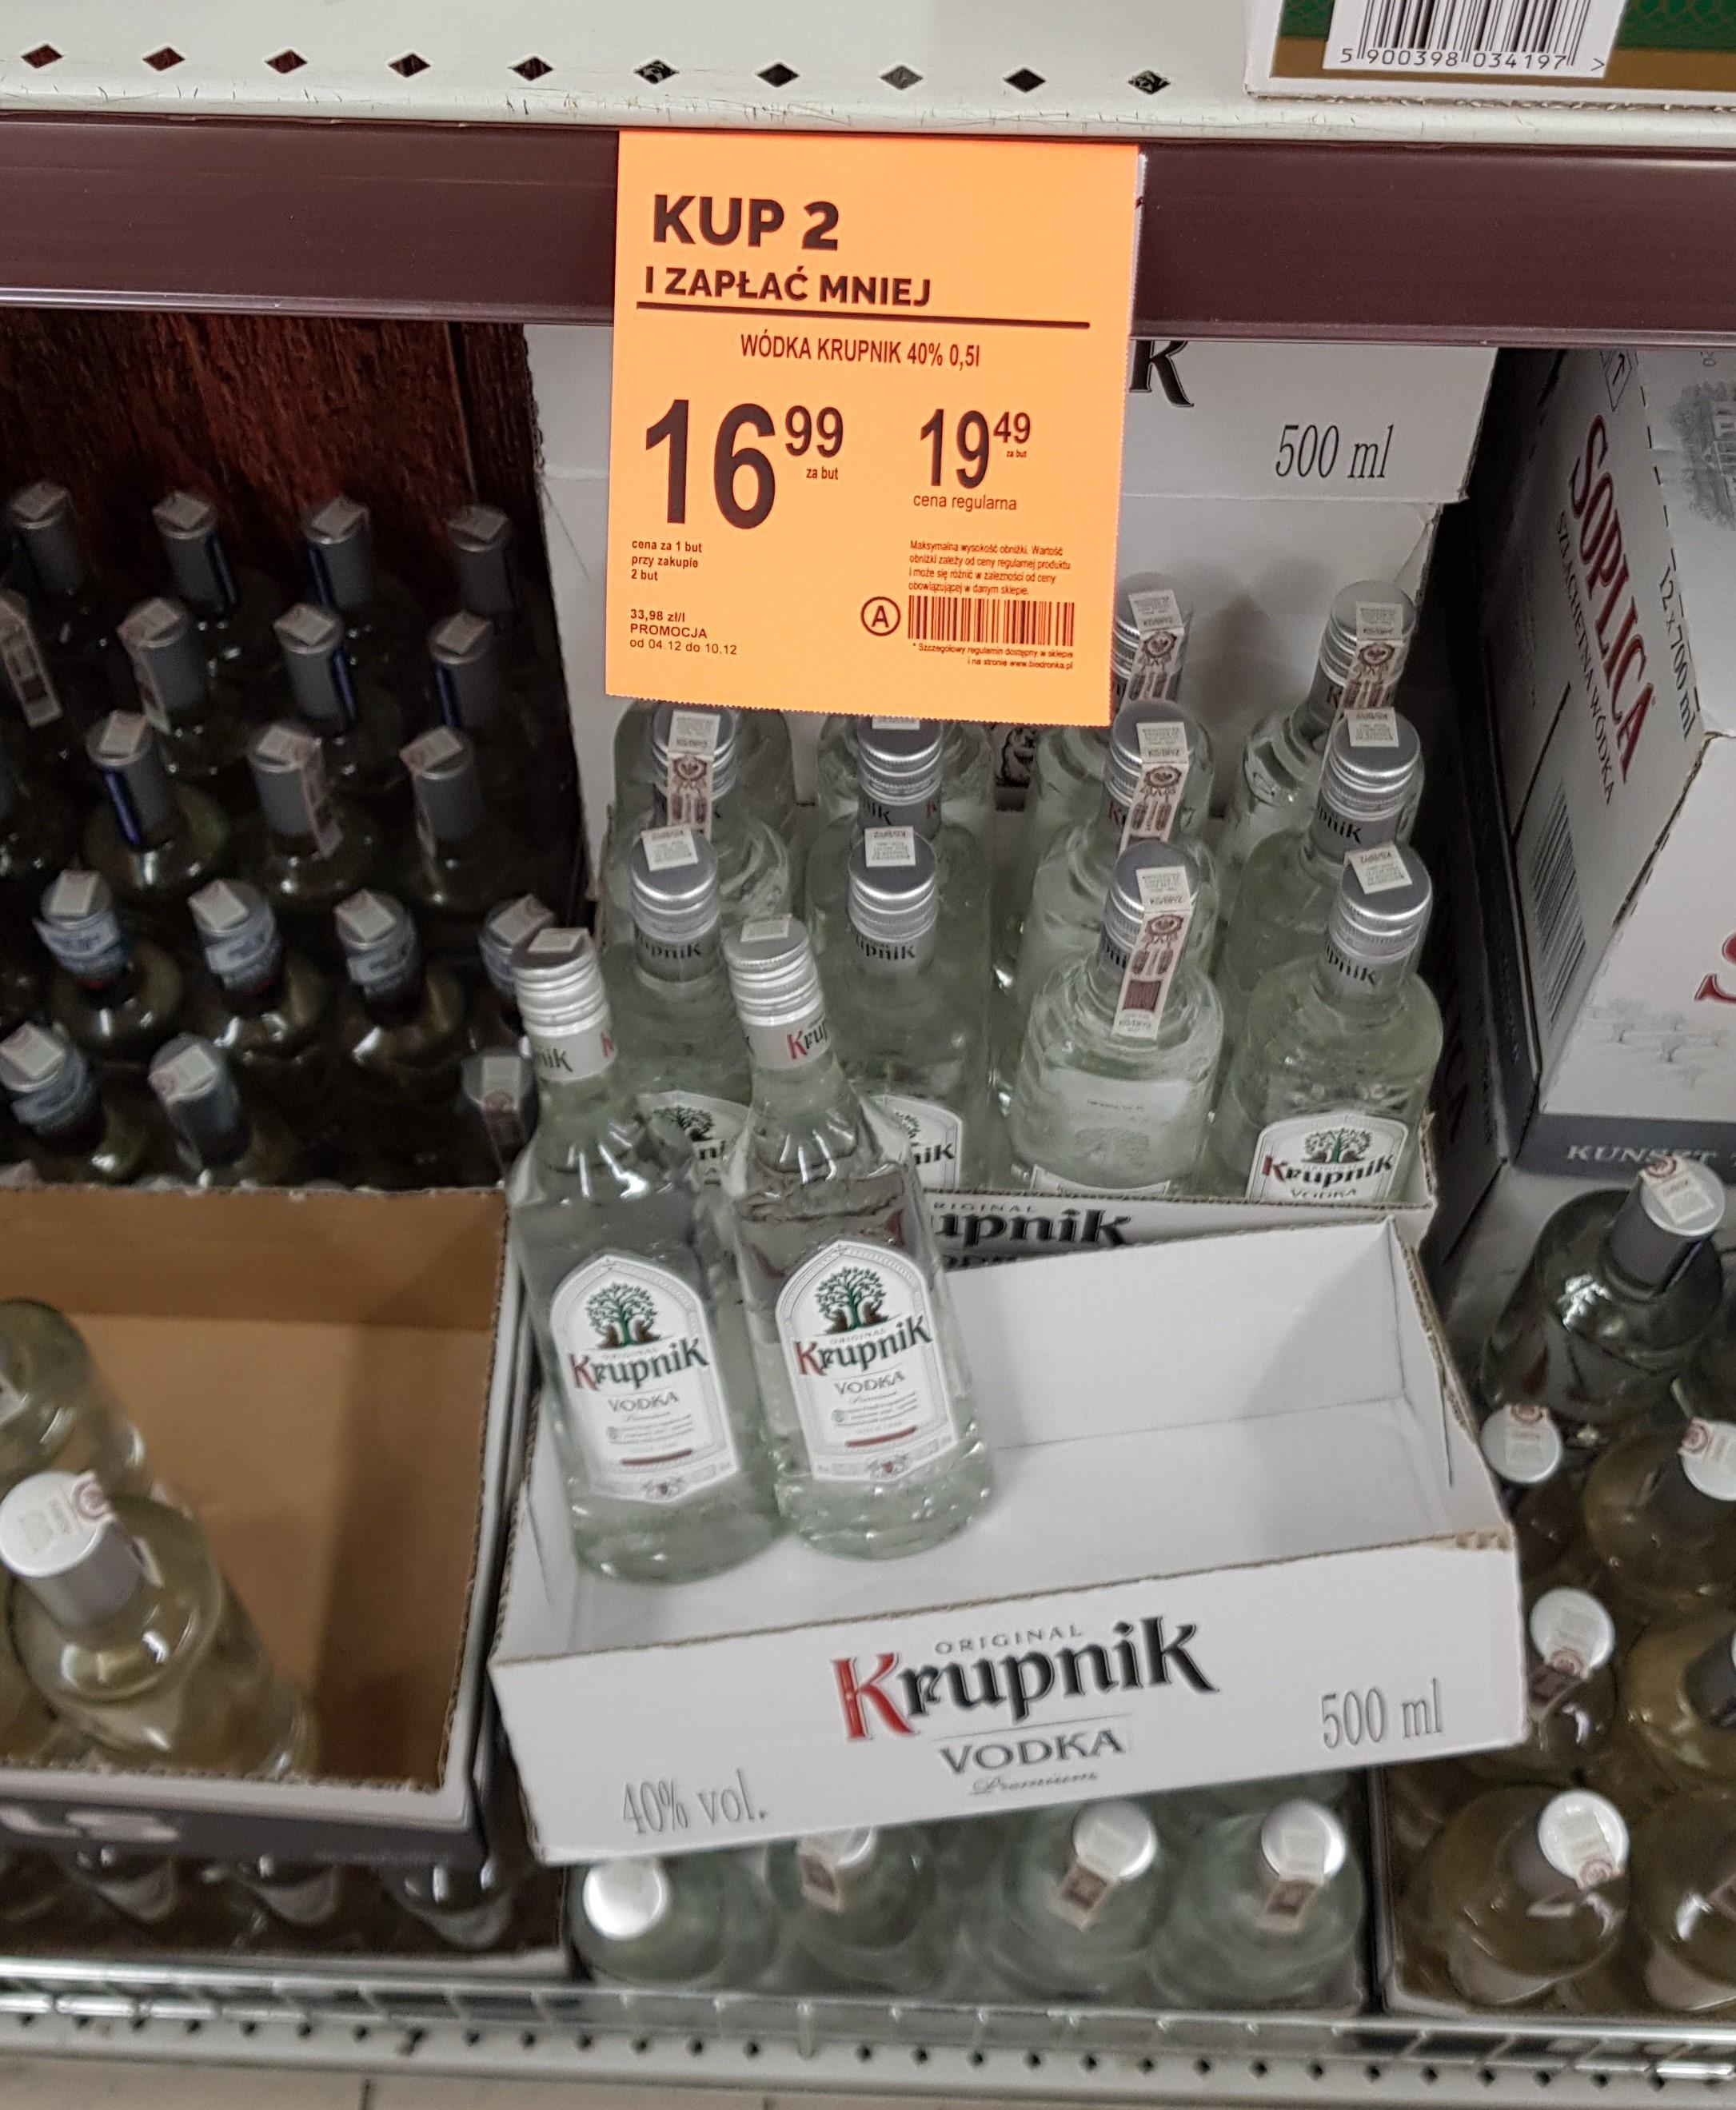 Wódka Krupnik 40% 0,5 l